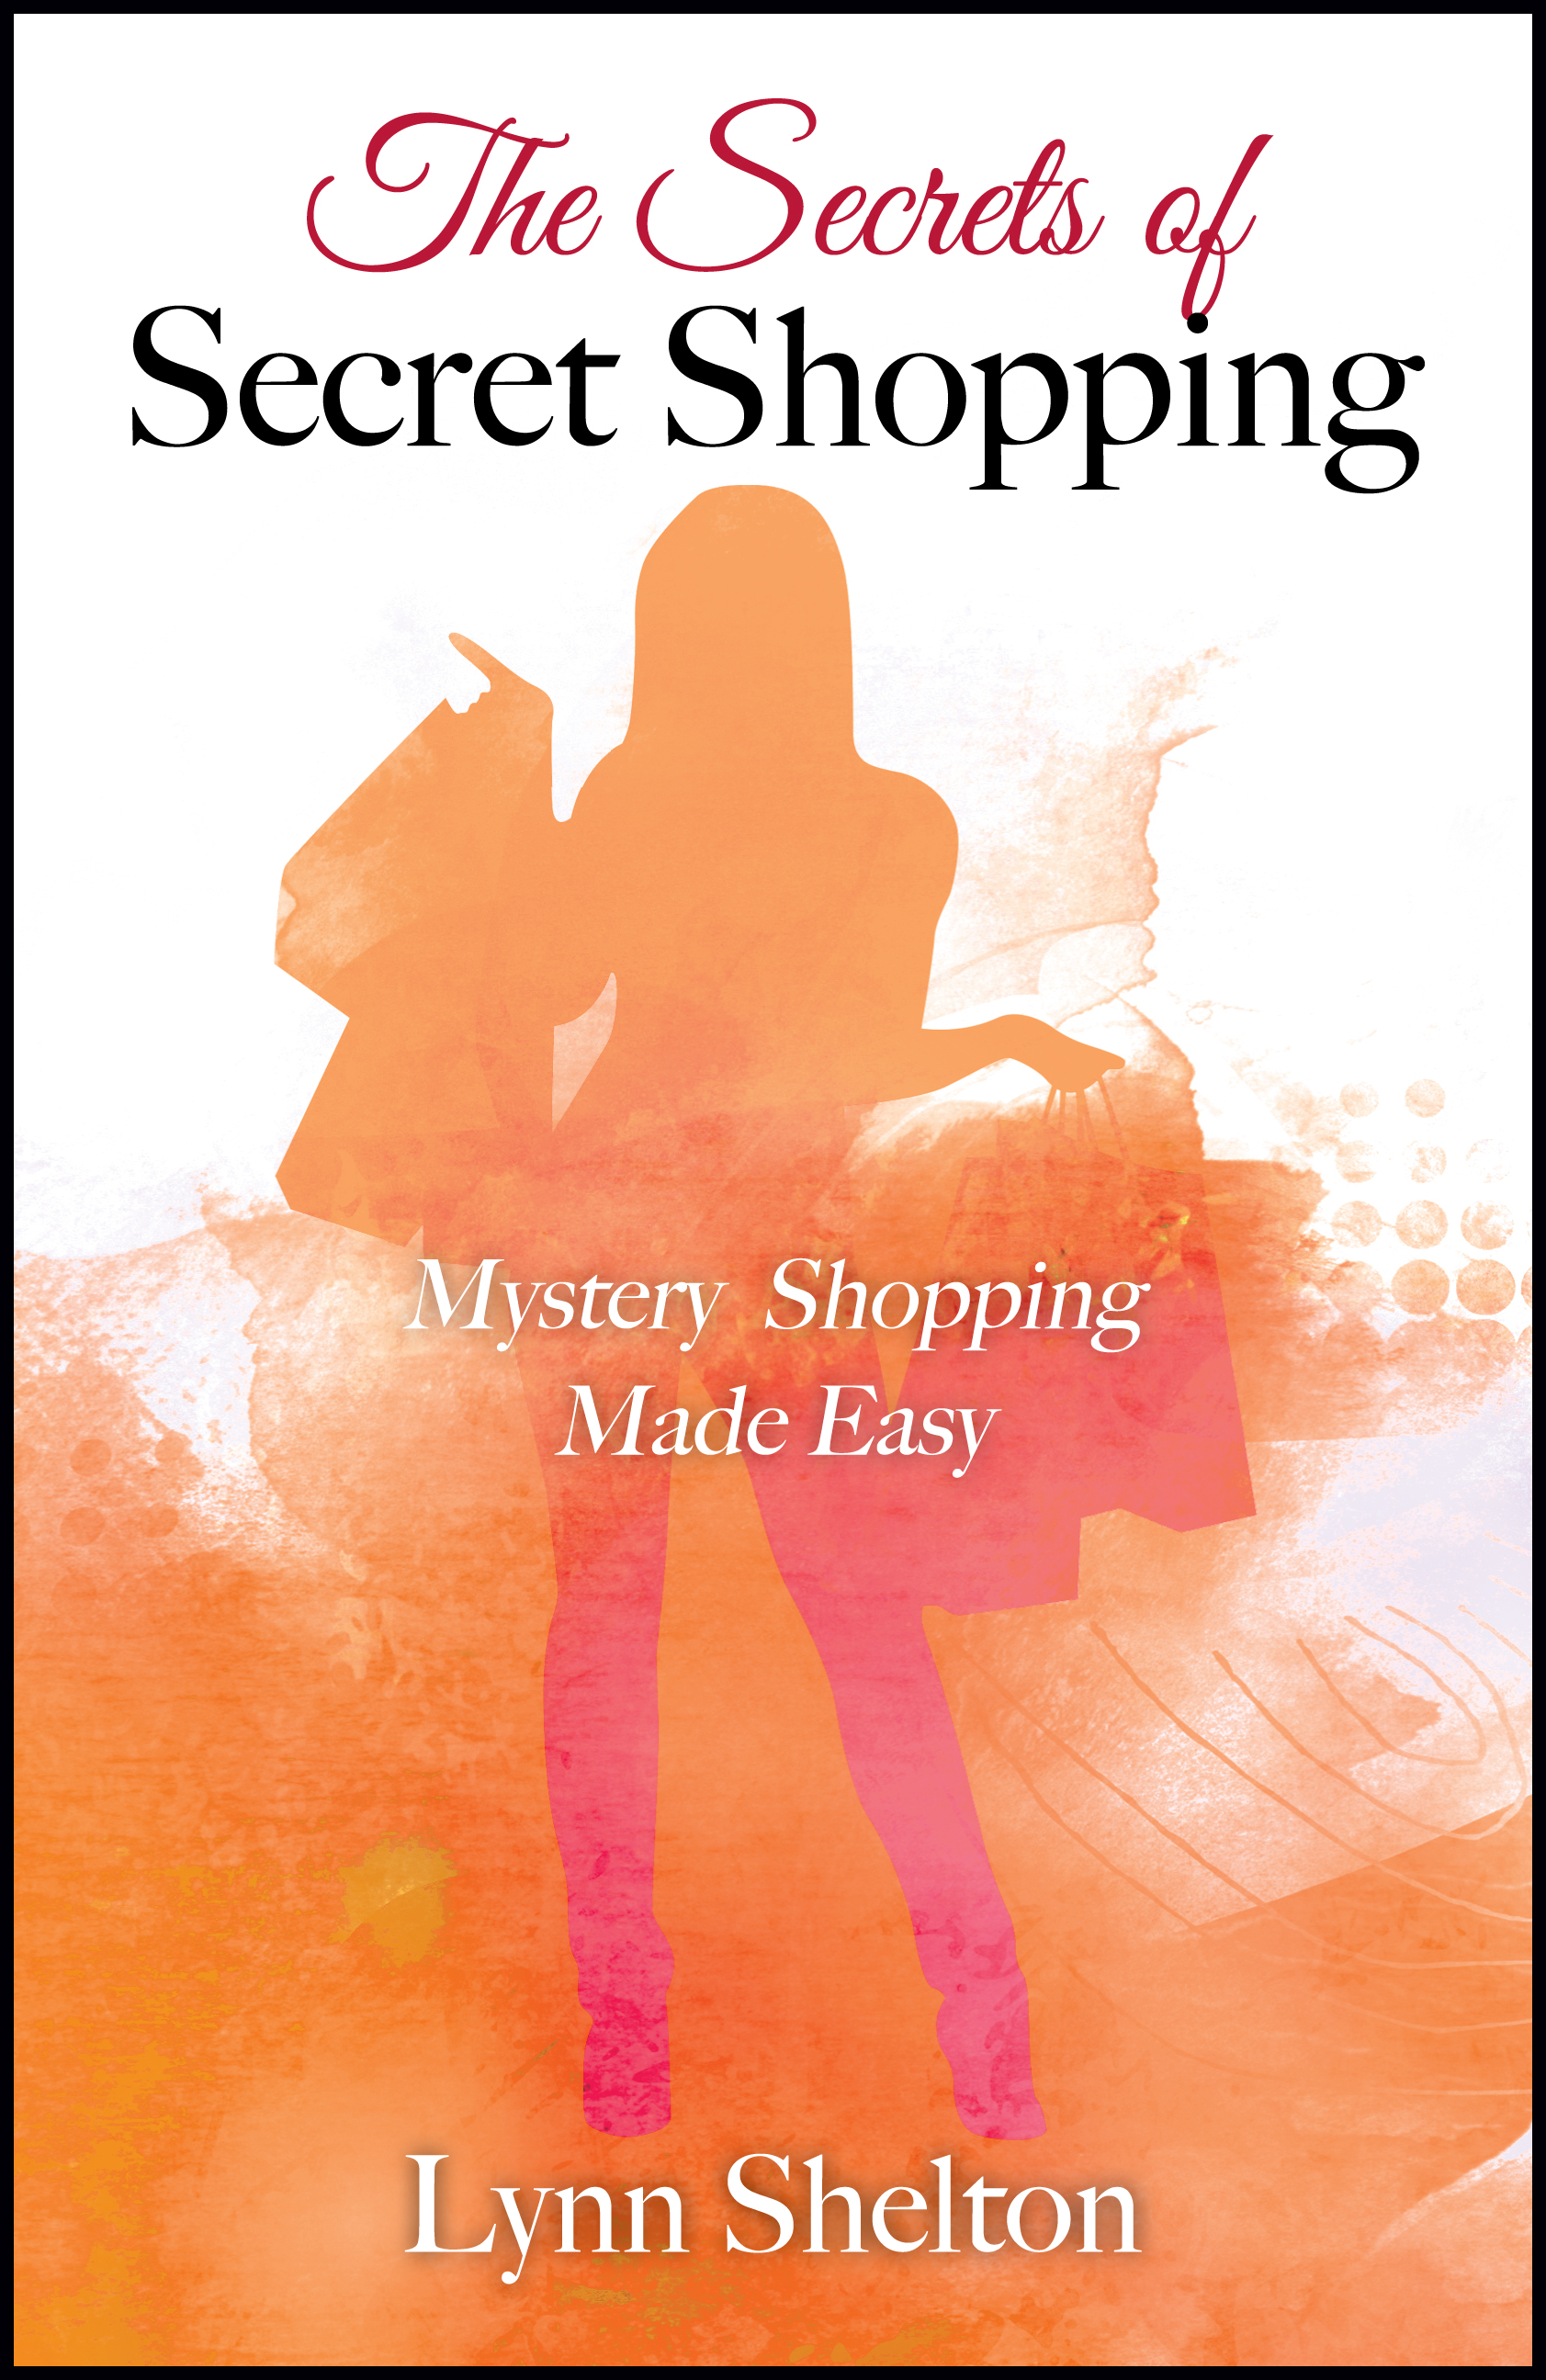 The Secrets of Secret Shopping